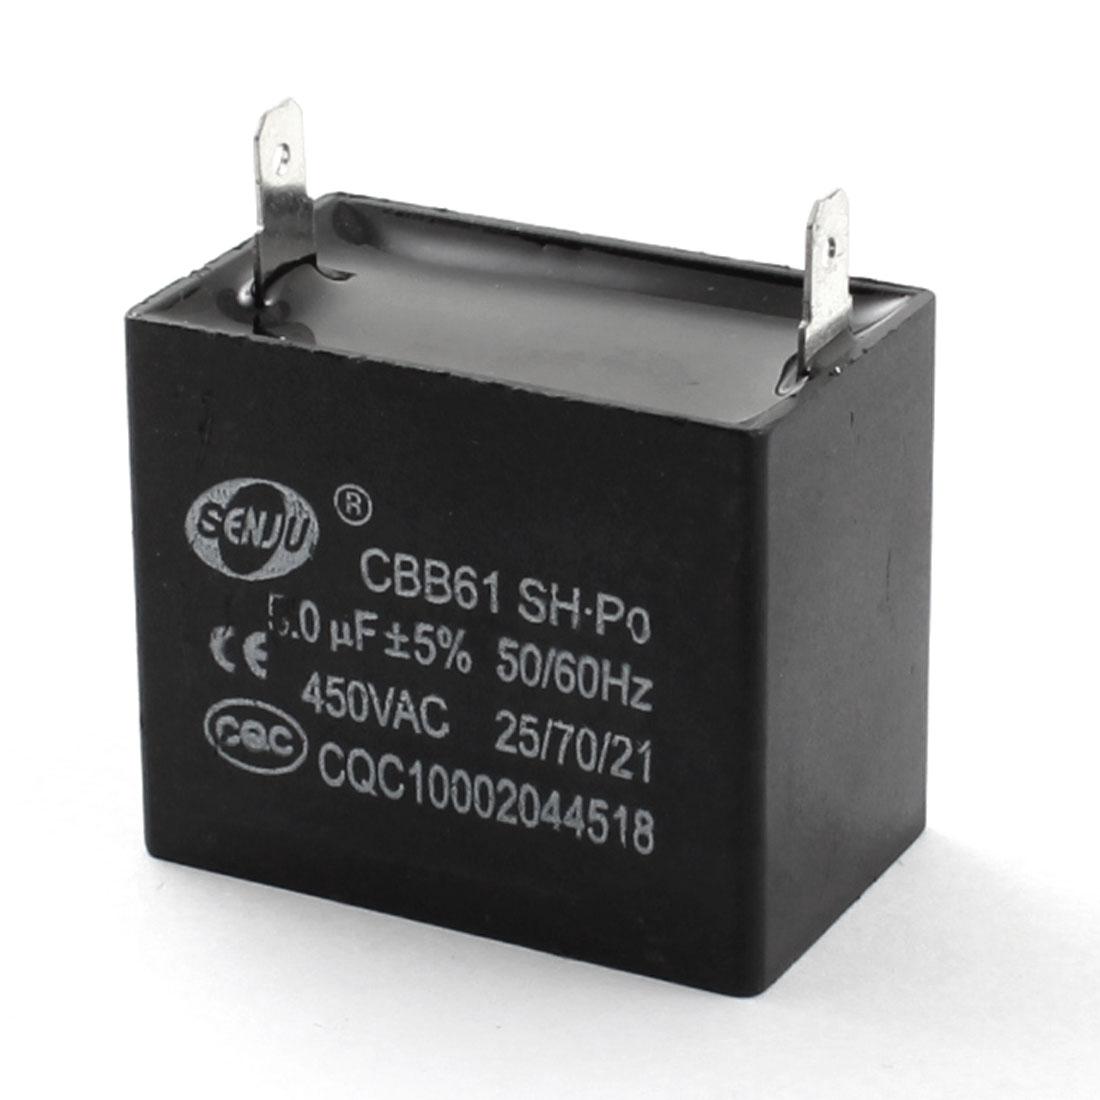 CBB61 AC 450V 5uF Rectangle Polypropylene Film Air Conditioner Ceiling Fan Motor Running Capacitor